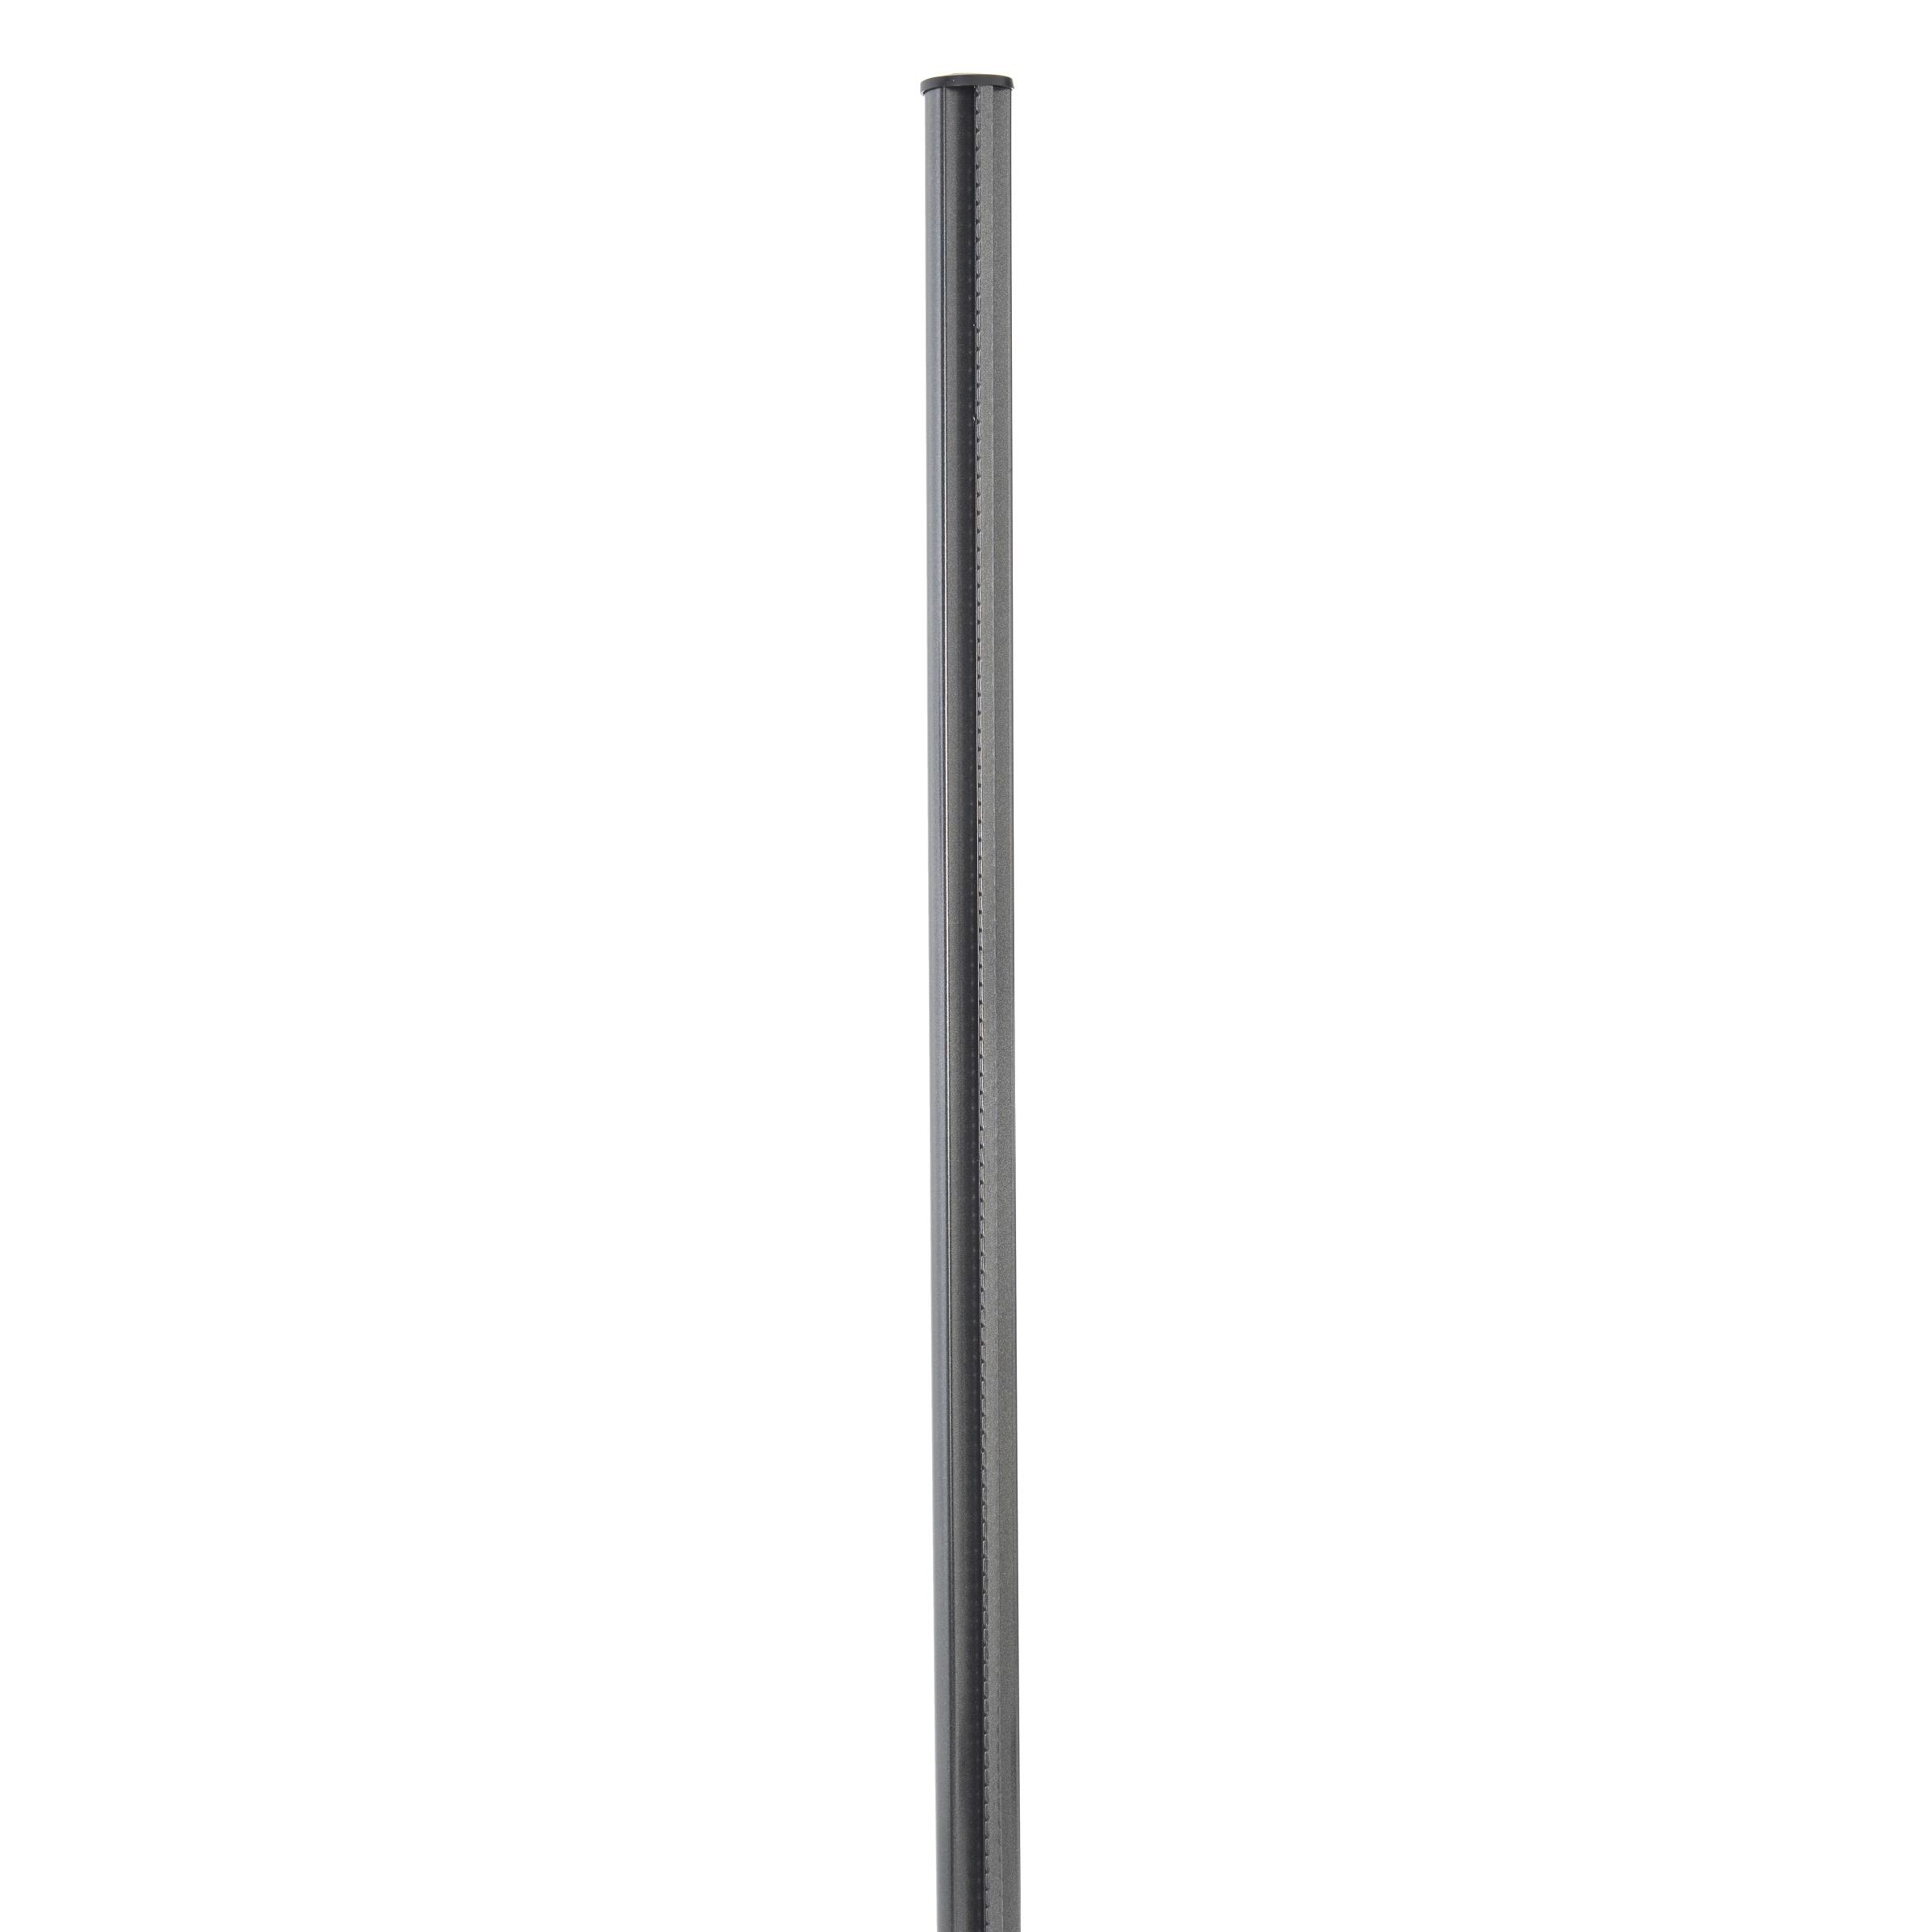 Bekaclippaal antraciet 4,8x70 cm